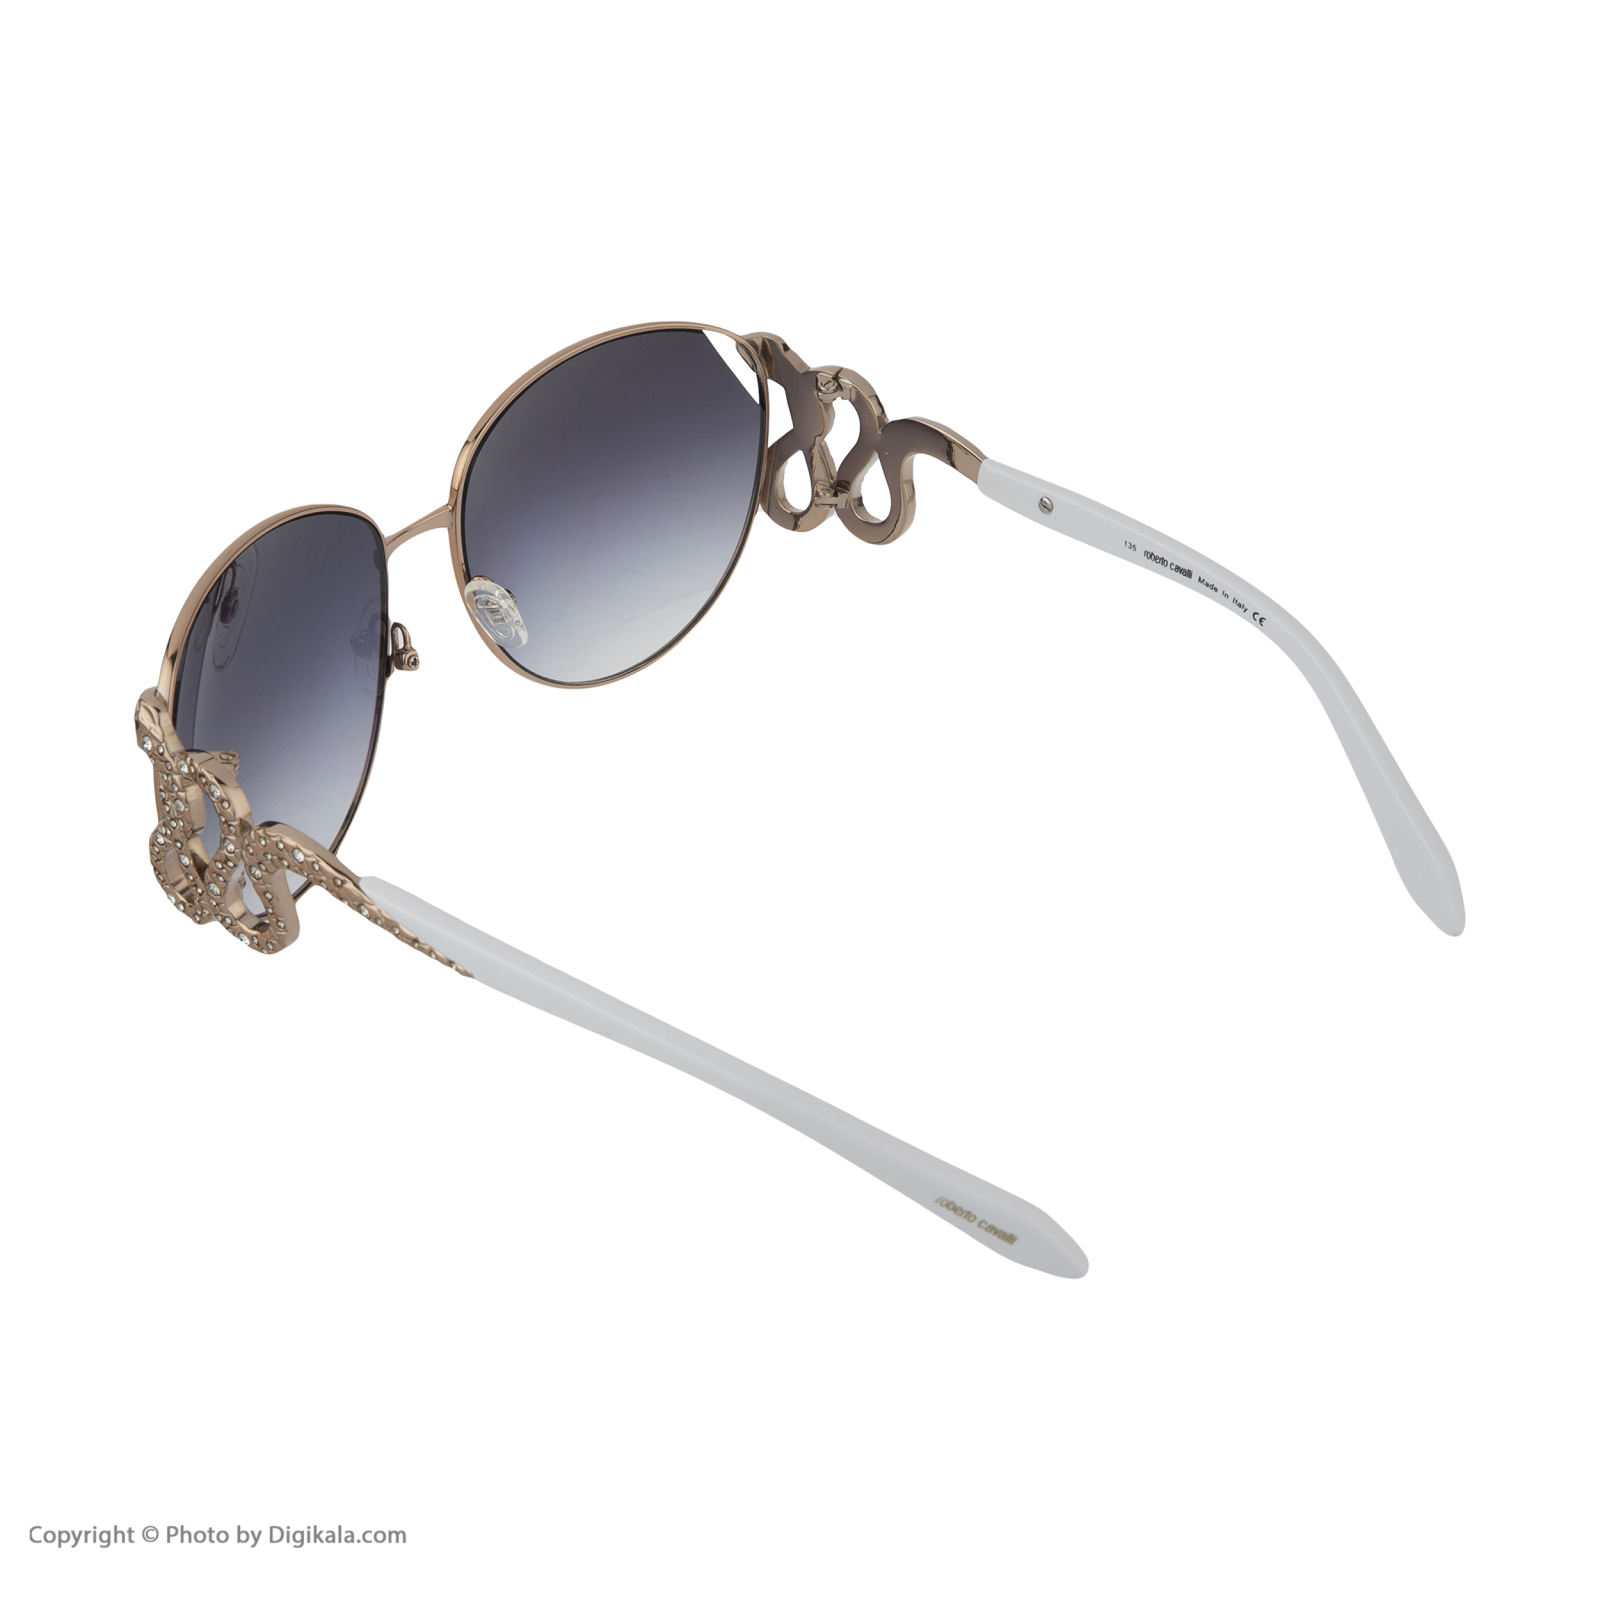 عینک آفتابی زنانه روبرتو کاوالی مدل 897 -  - 4